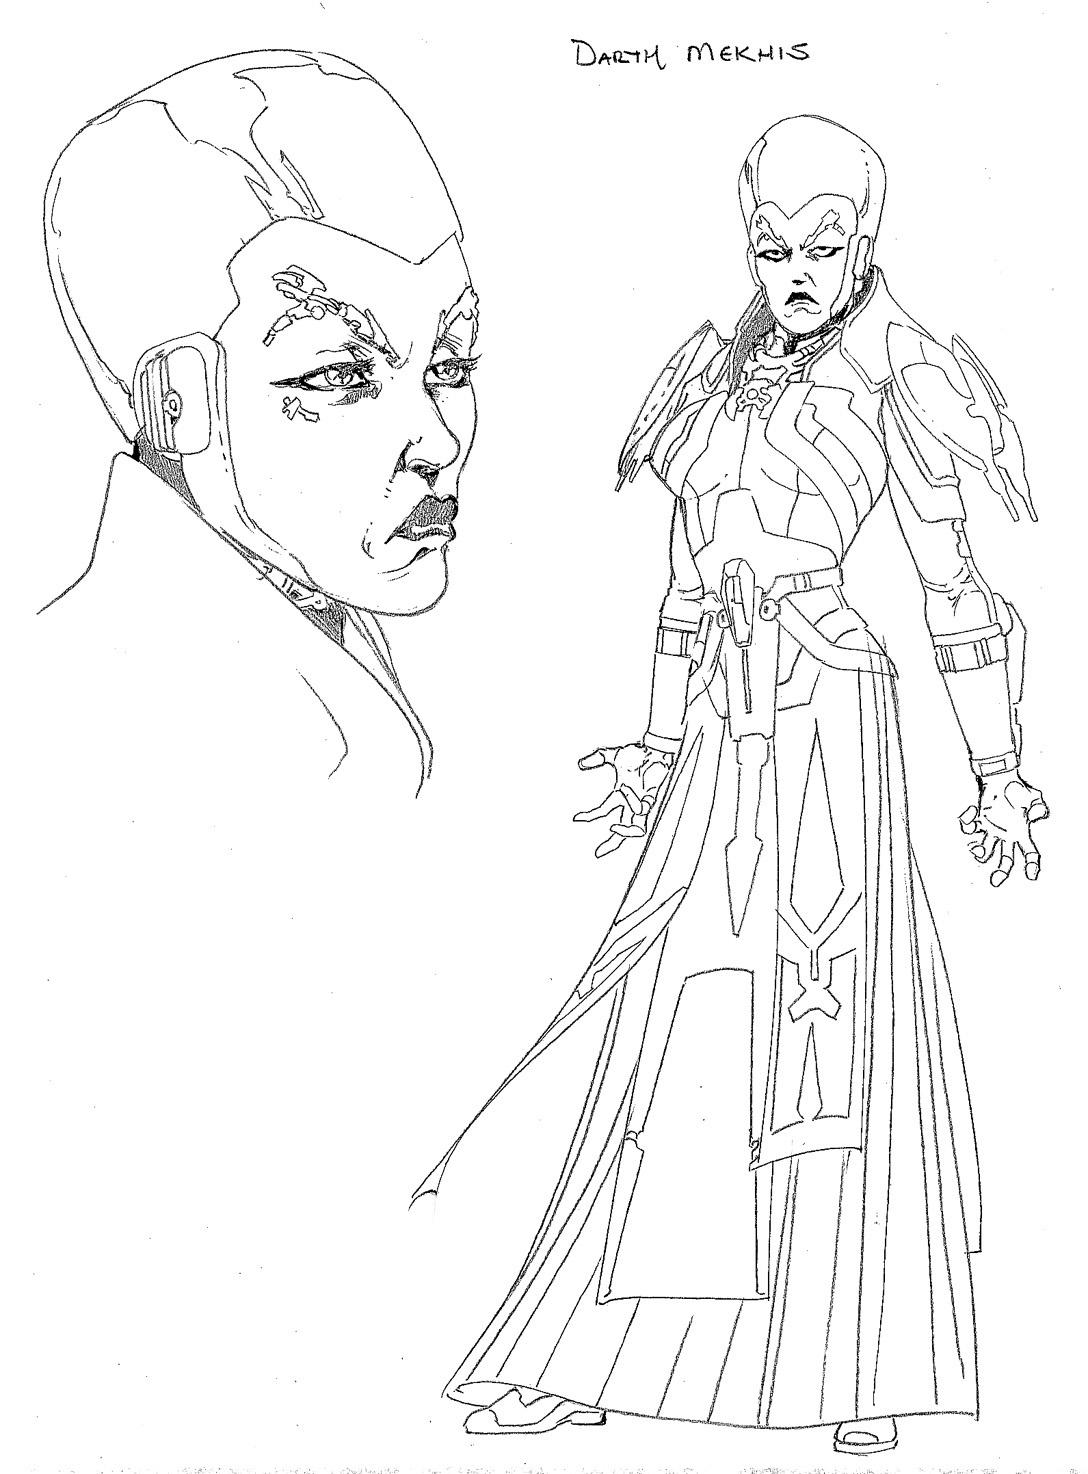 Star Wars Friday The Old Republic Character Sketches  Blog  Dark Horse Comics